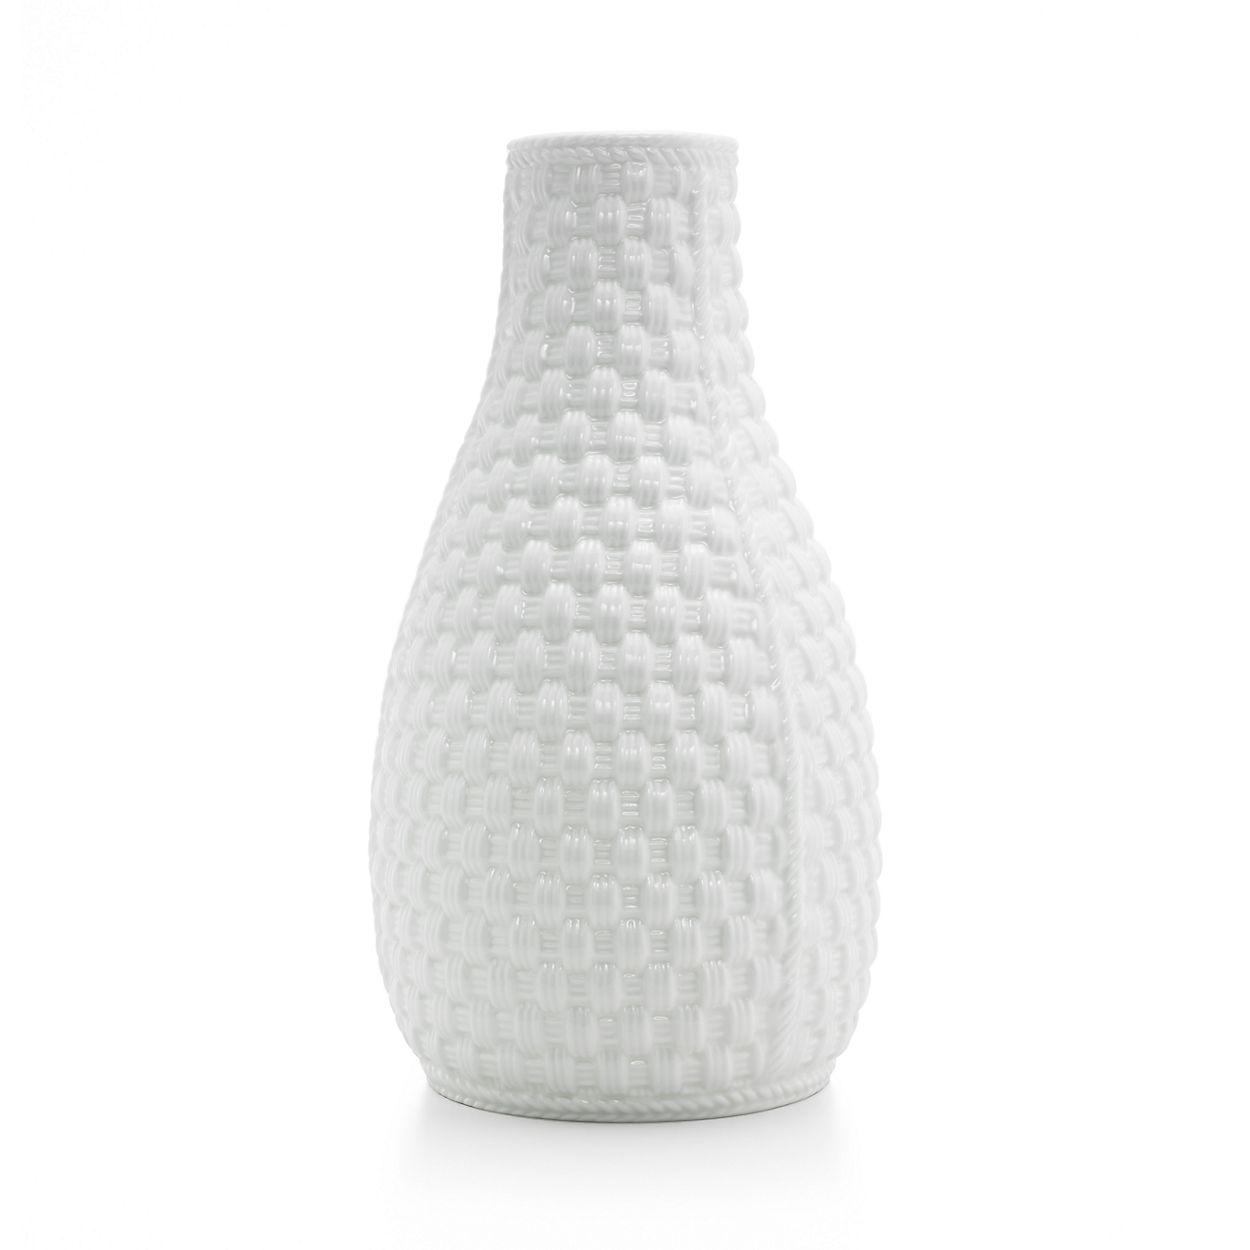 Tiffany weave vase in irish parian bone china tiffany co tiffany weavevase tiffany weavevase reviewsmspy